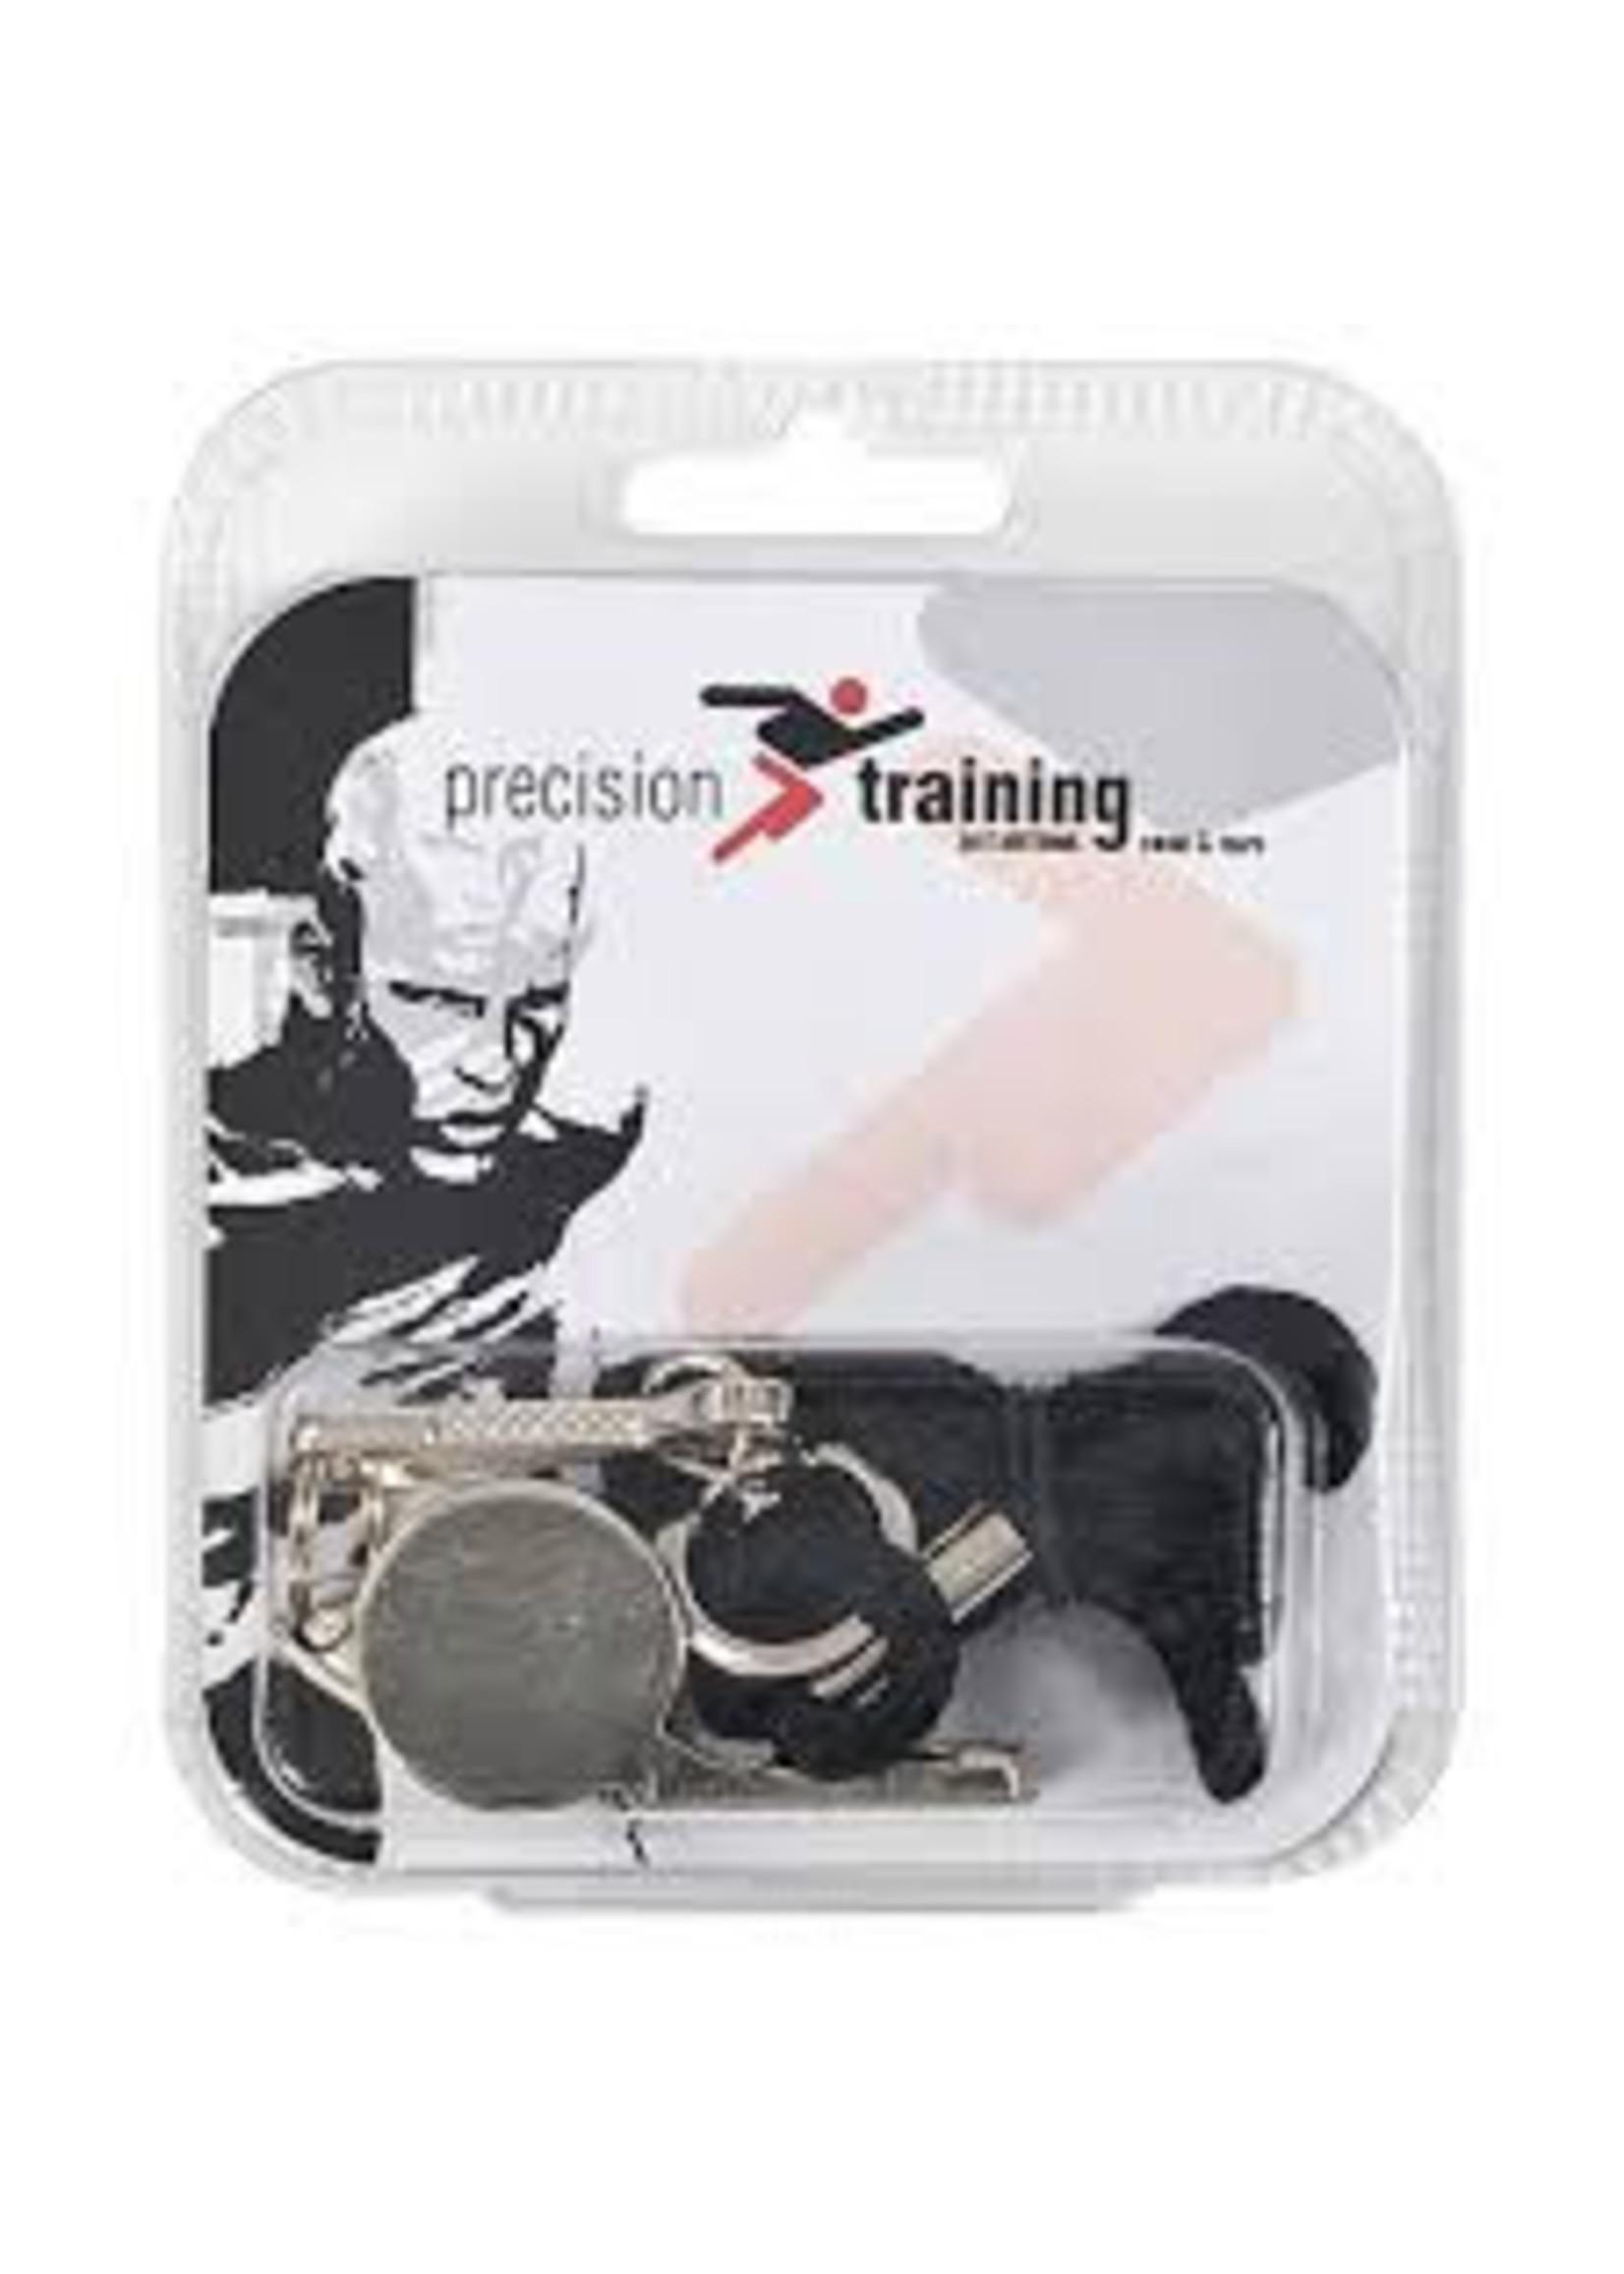 Precision Training Precision Training - Metal Whistle